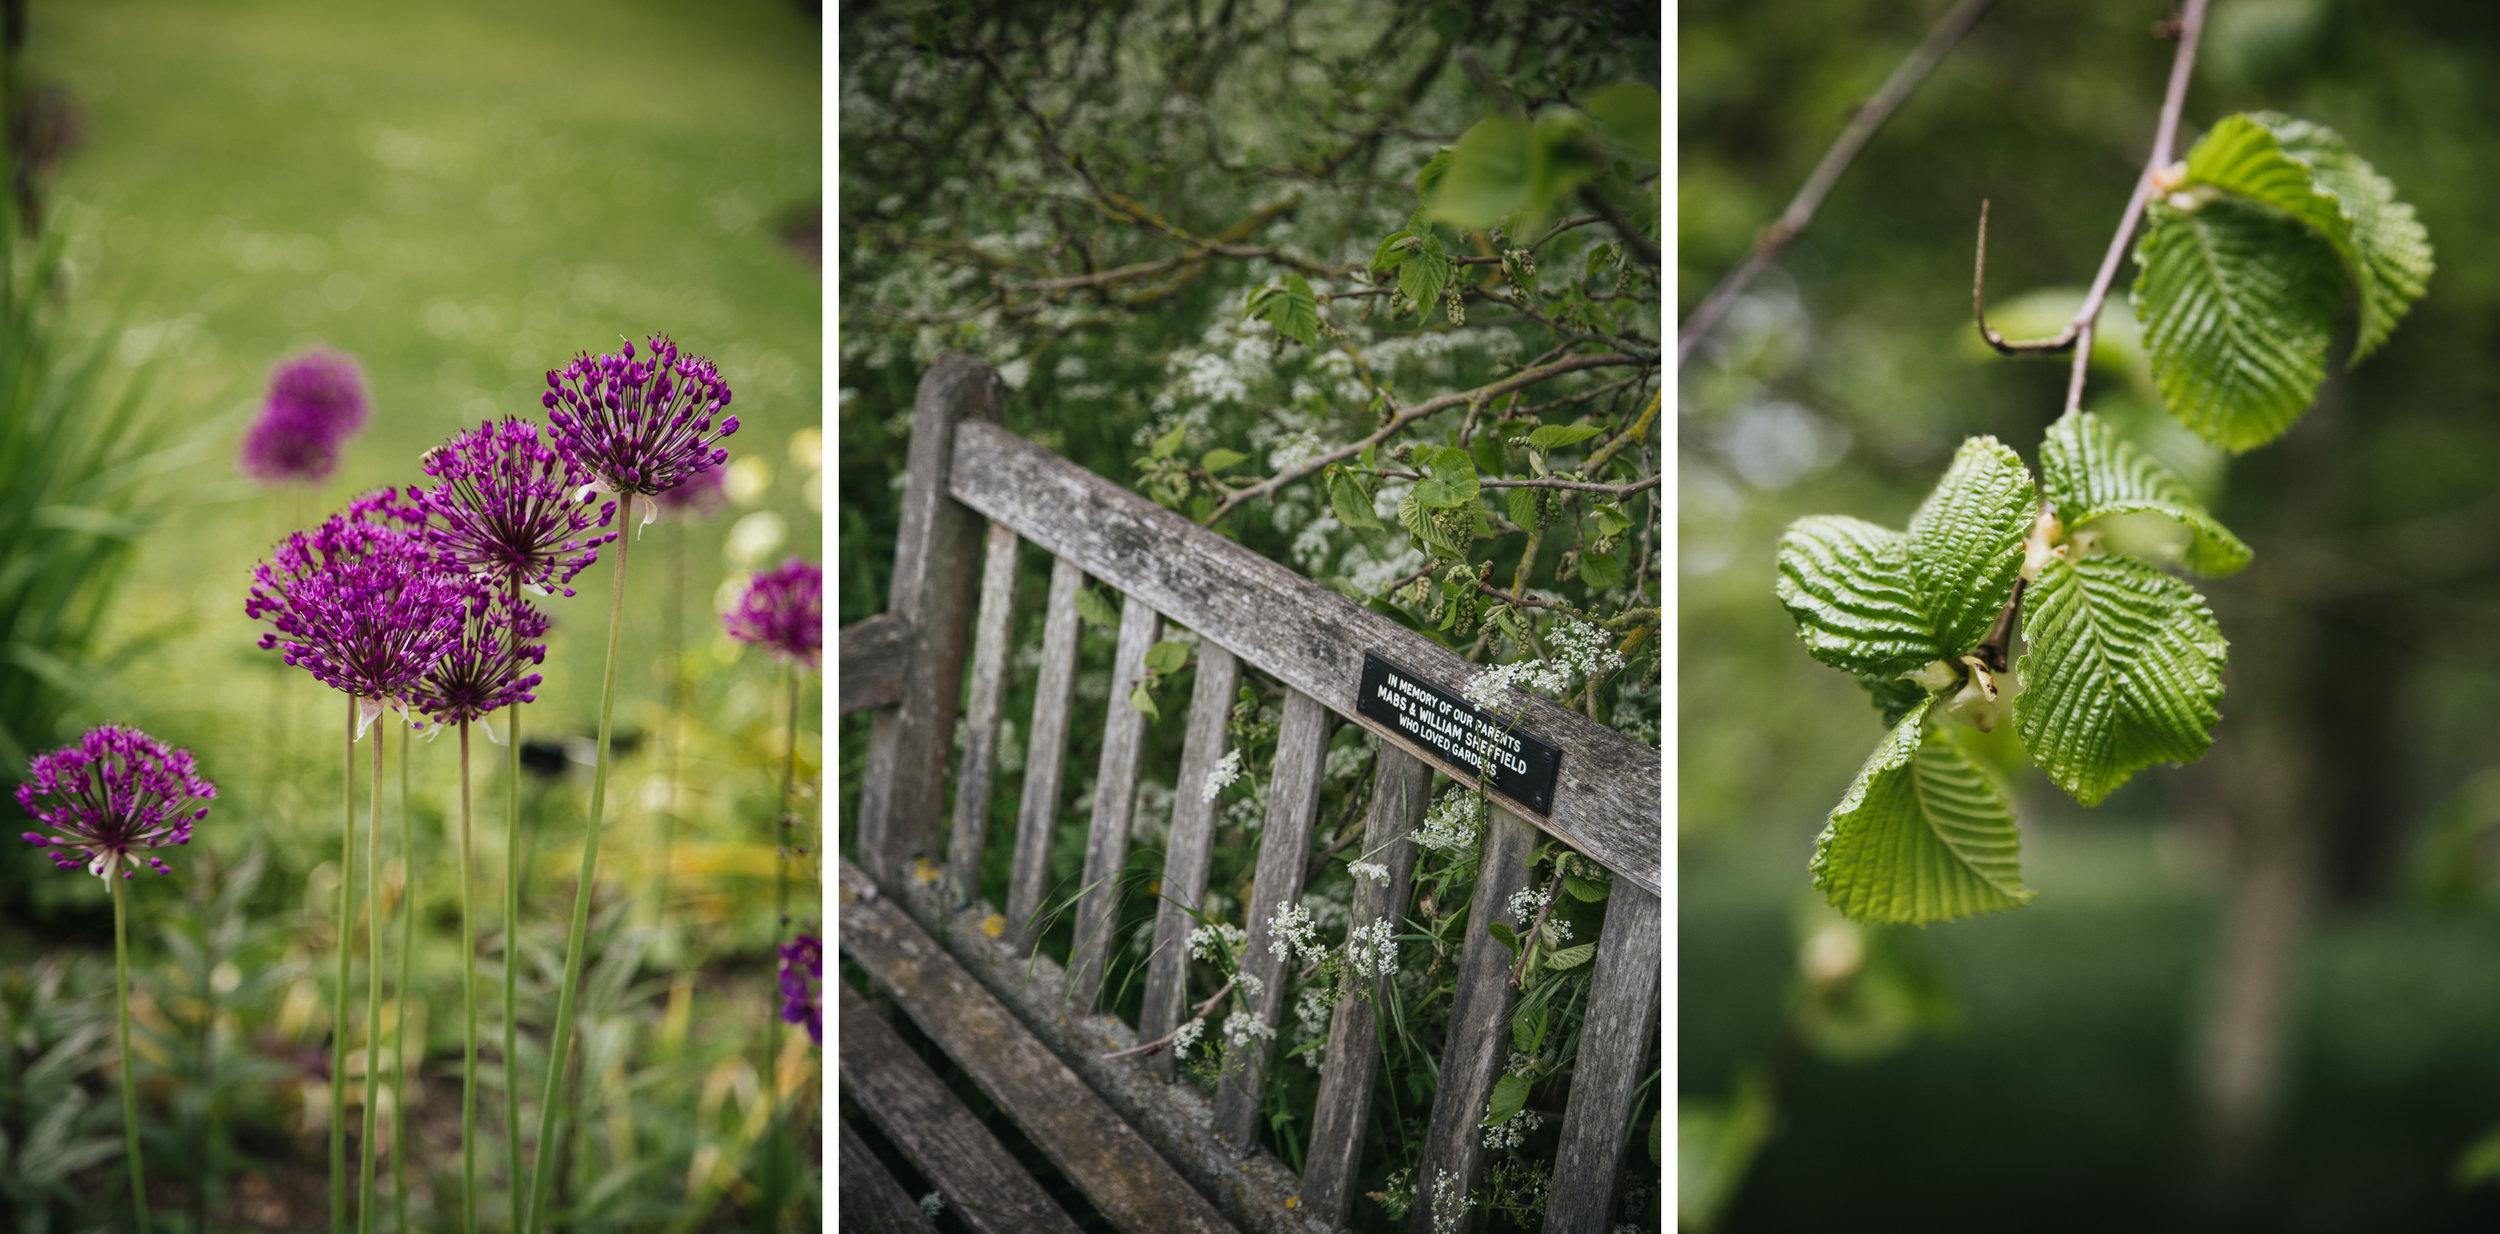 Jardin-botanique-cambridge-blog-voyage.jpg